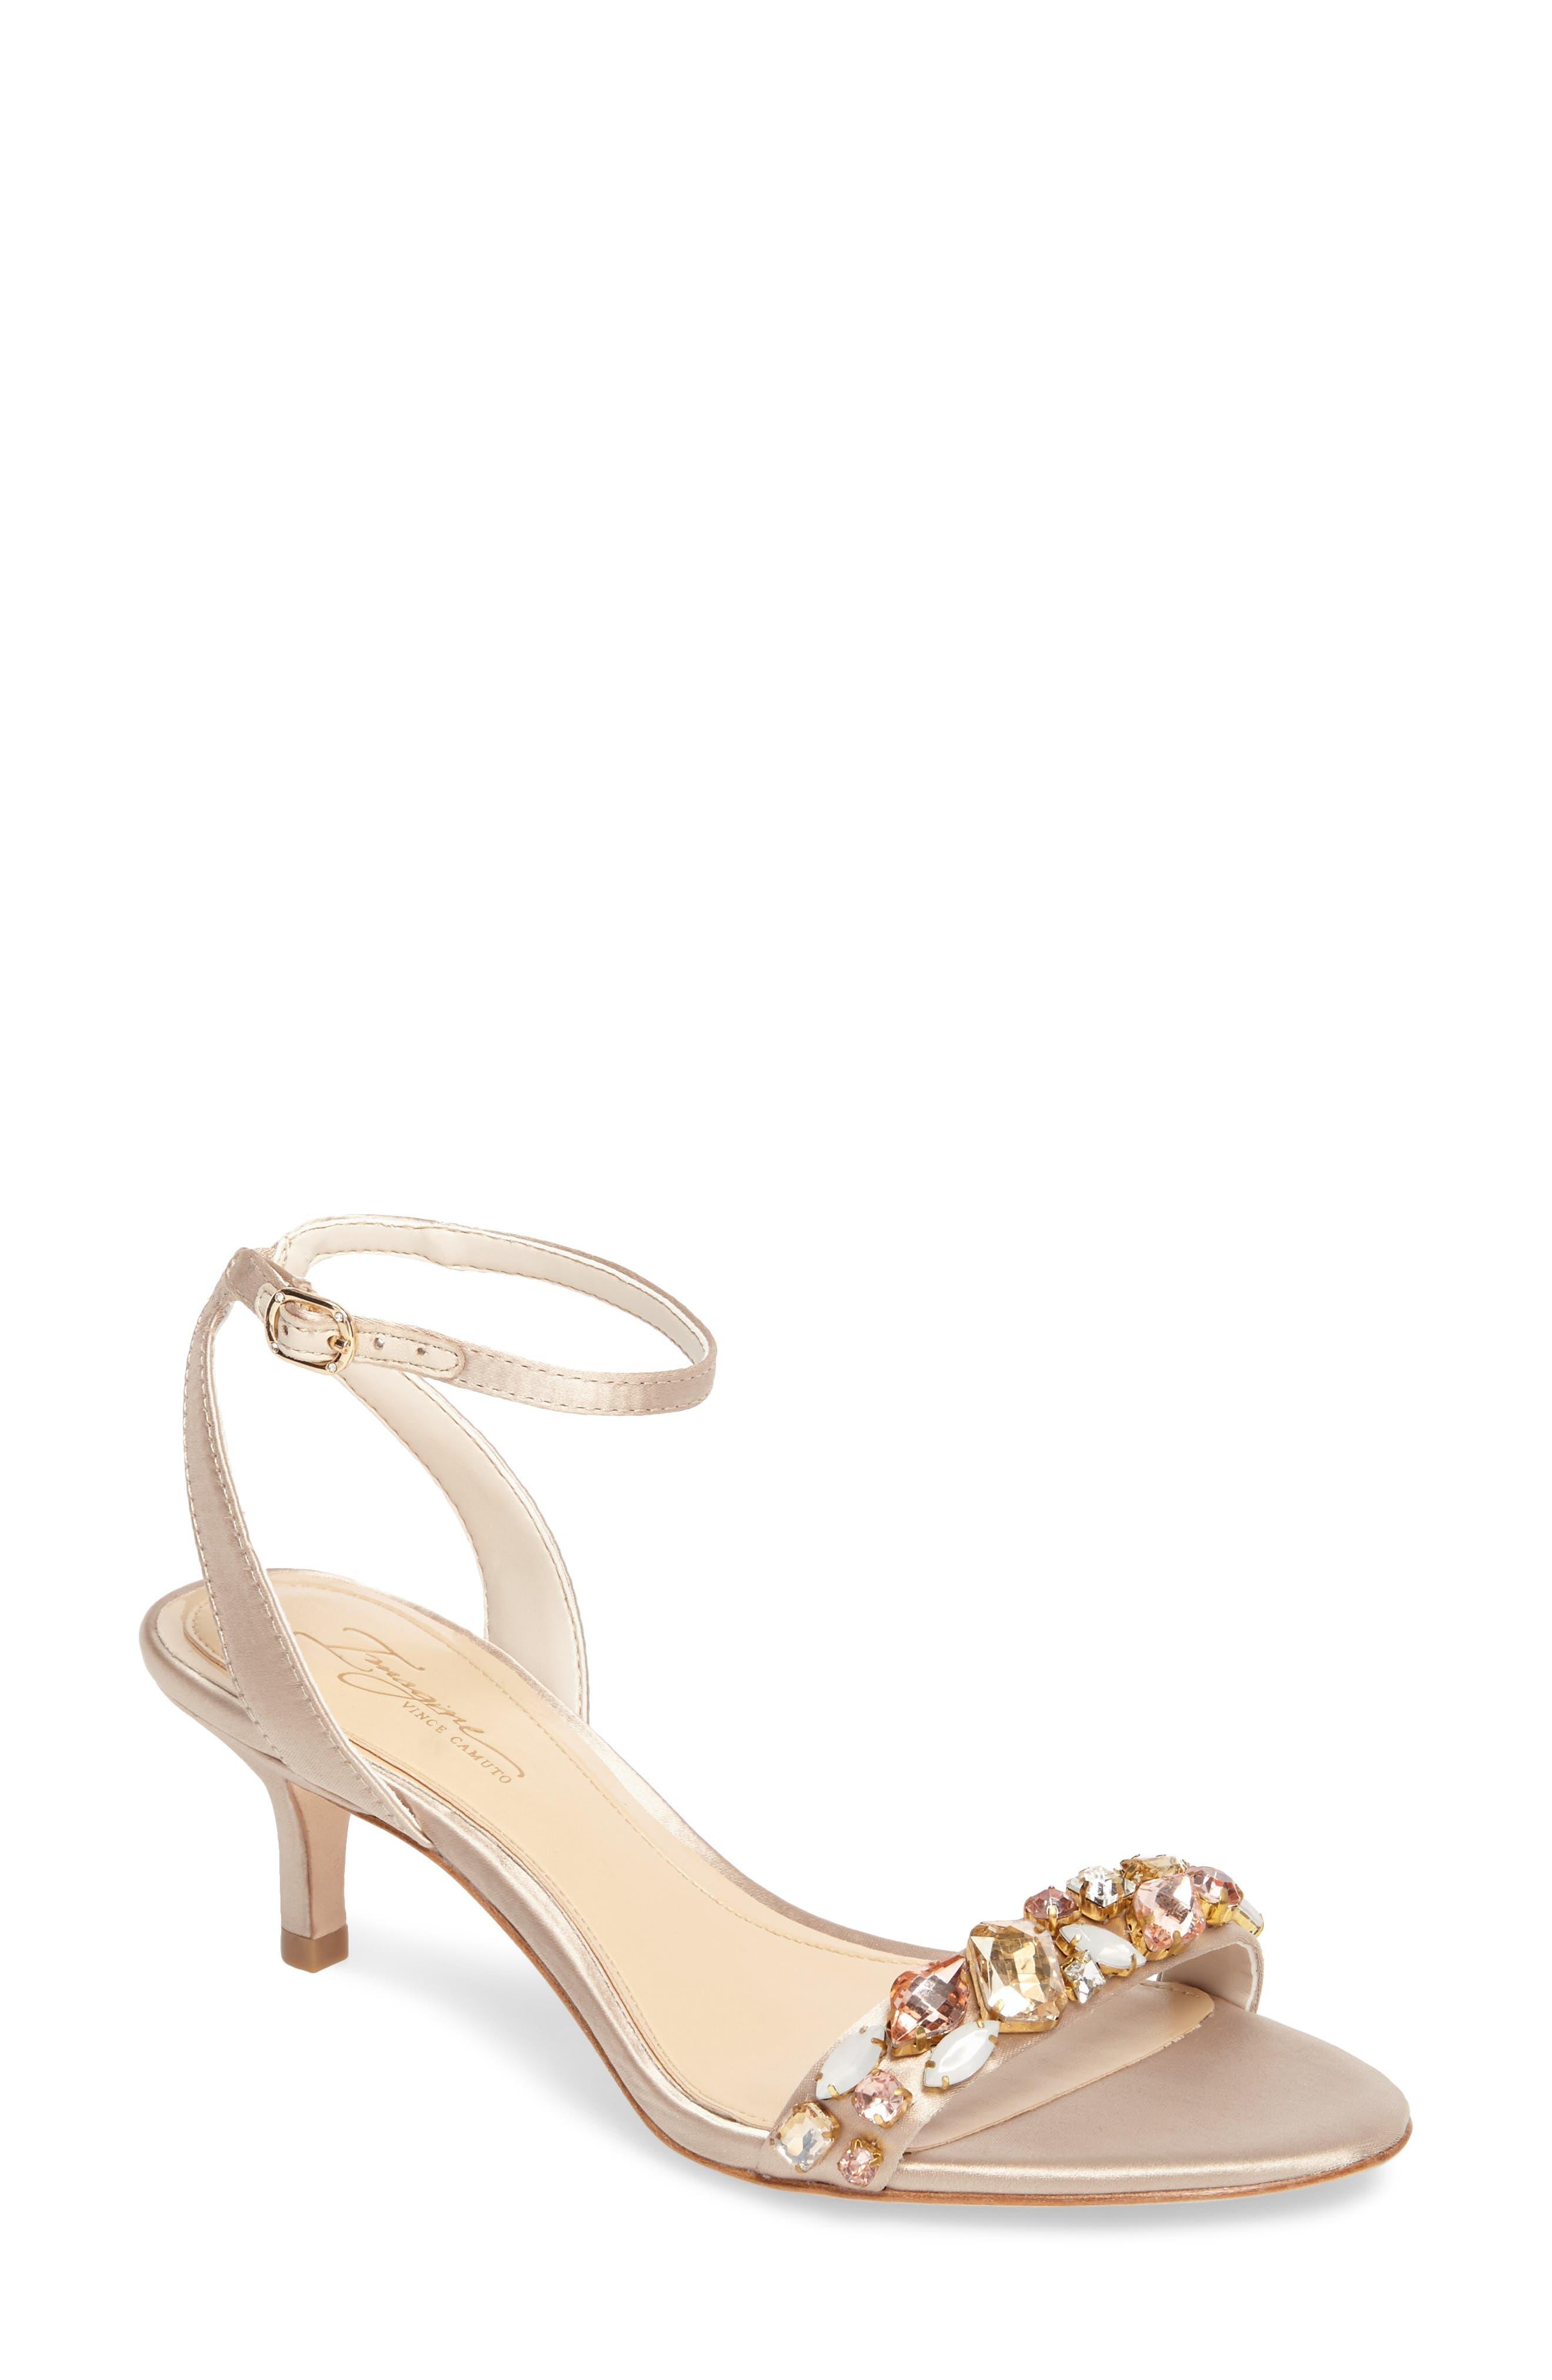 Imagine Vince Camuto Kolo Embellished Kitten Heel Sandal (Women)